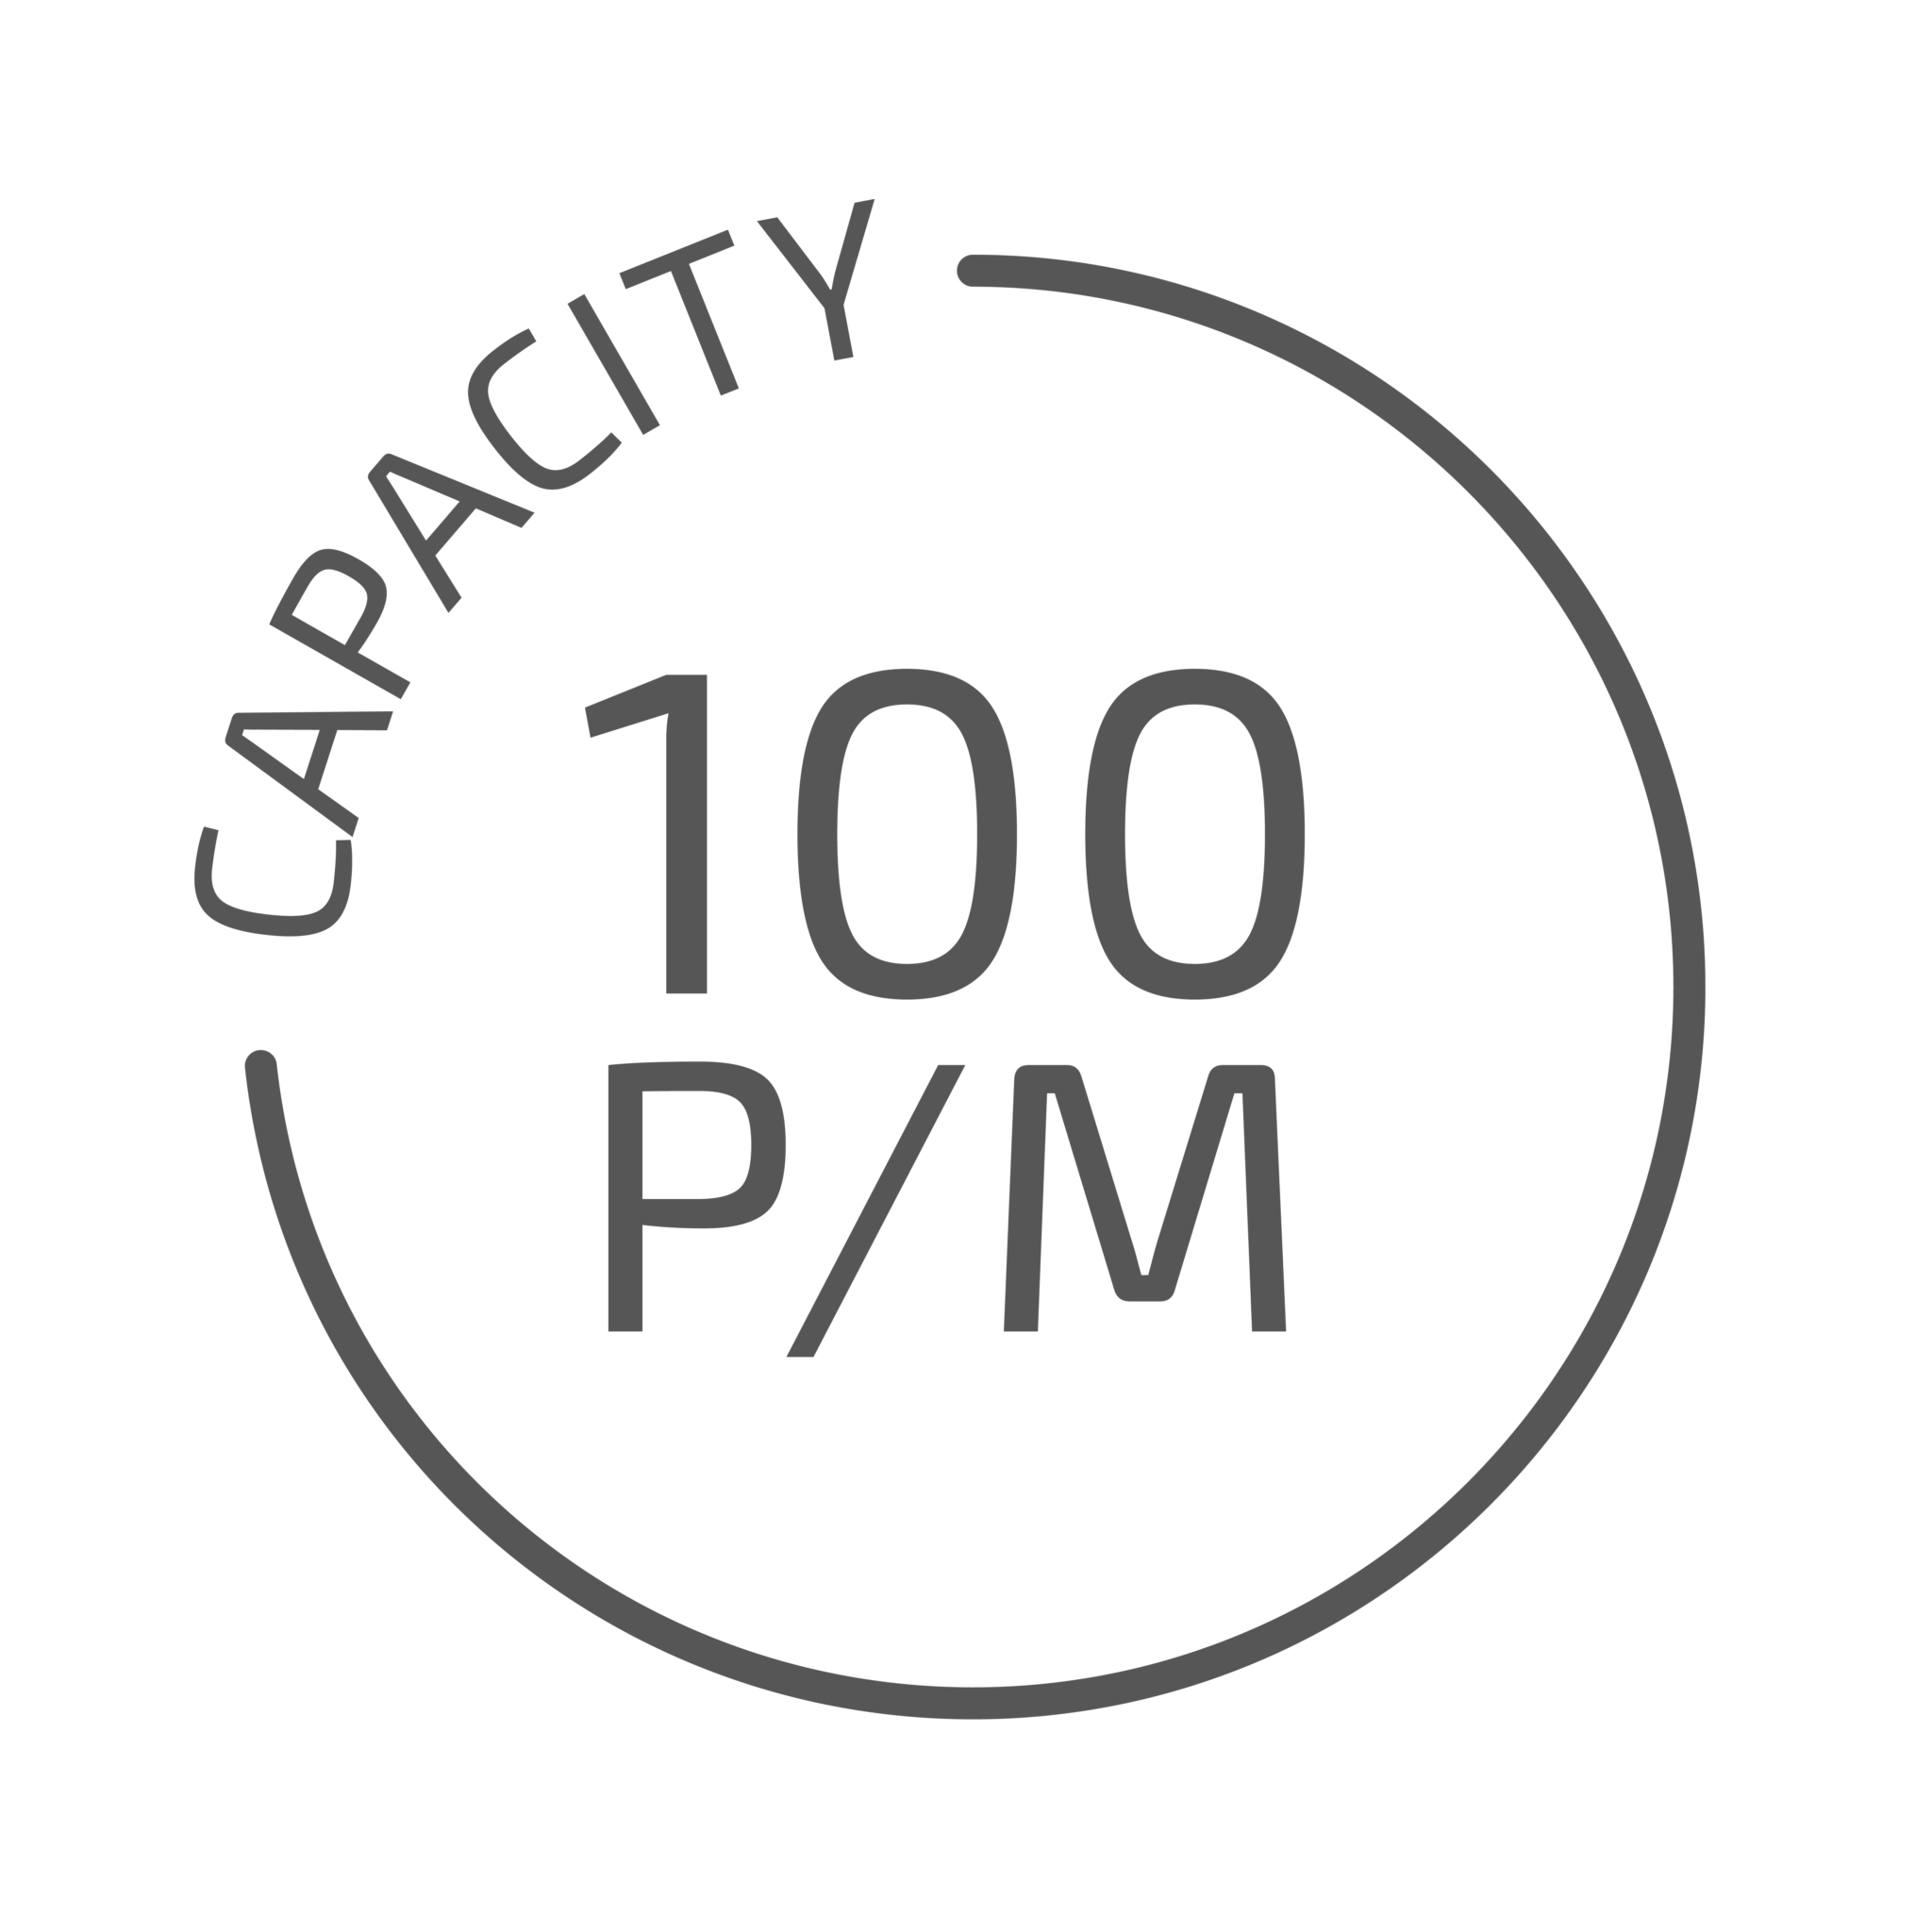 JASA Capacity 100 icoon